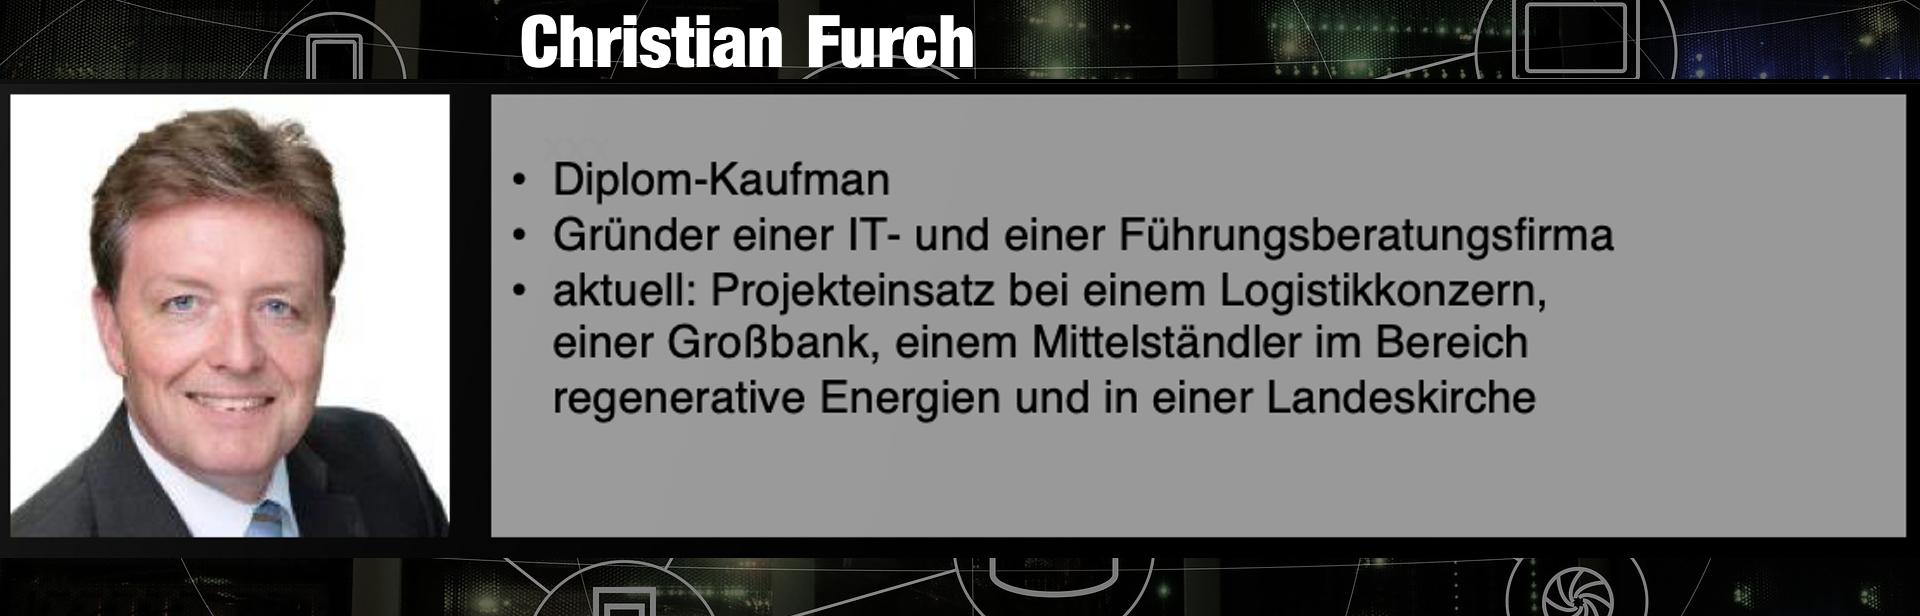 Christian Furch